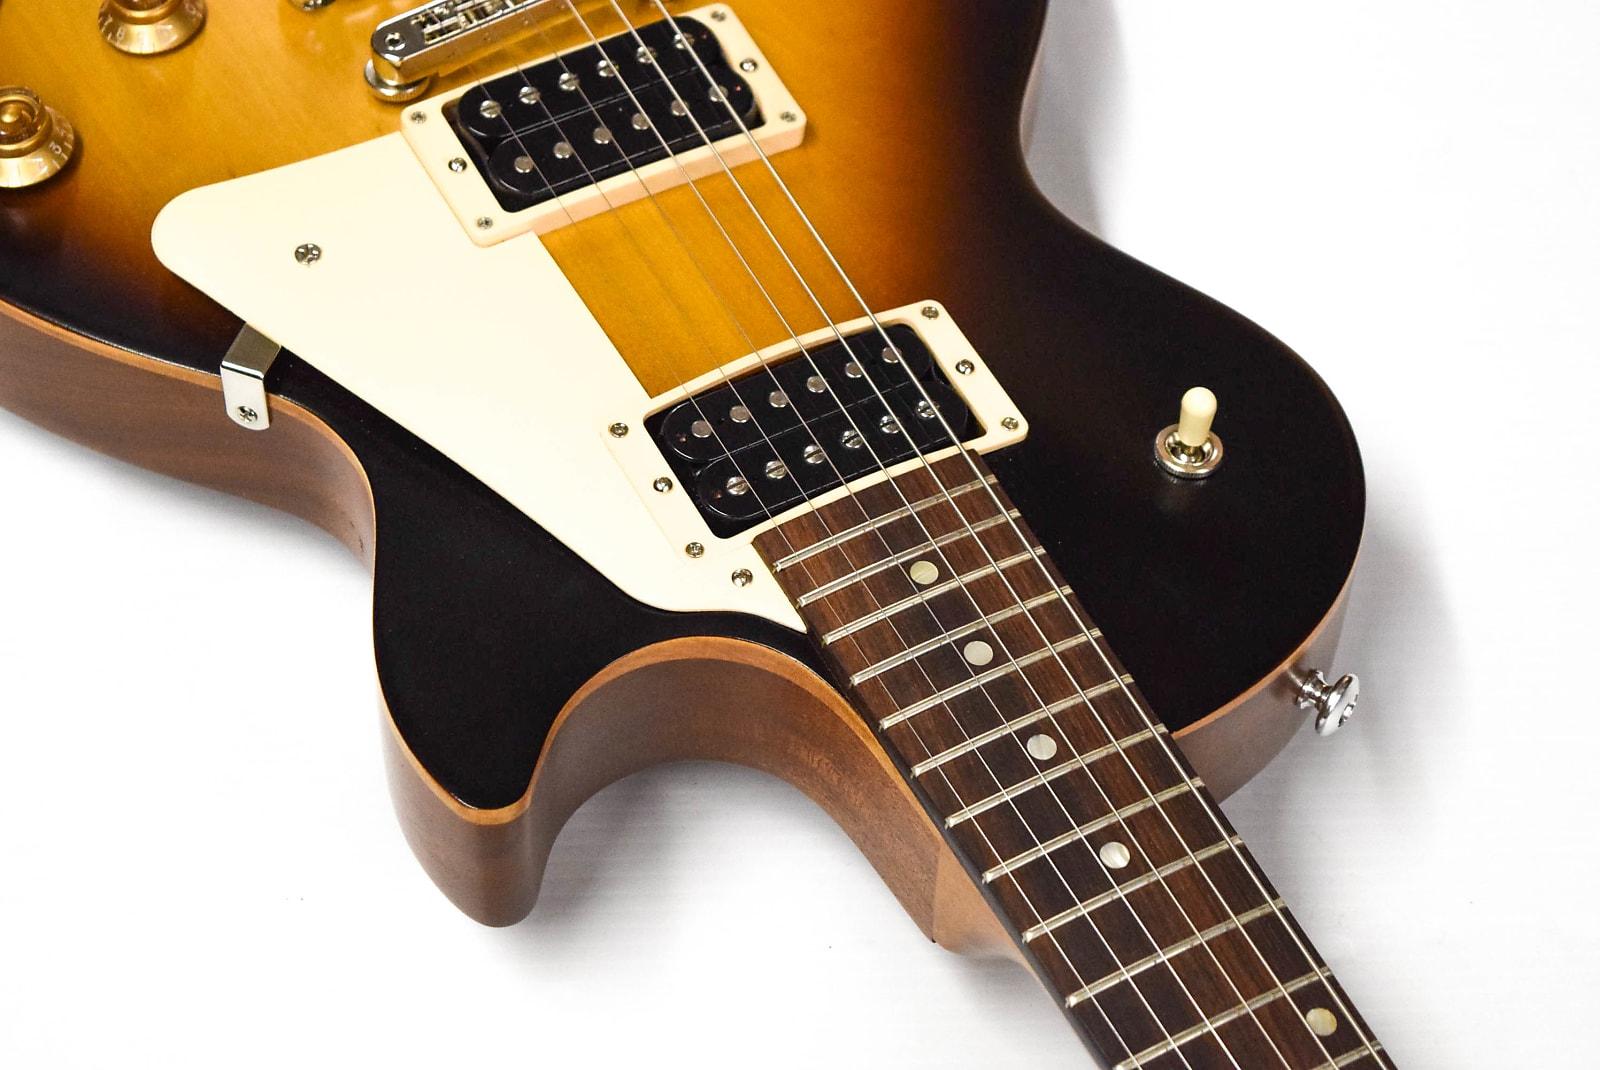 08c320bba45e4 ... Gibson Les Paul Studio Tribute 2019 Satin Tobacco Burst ...